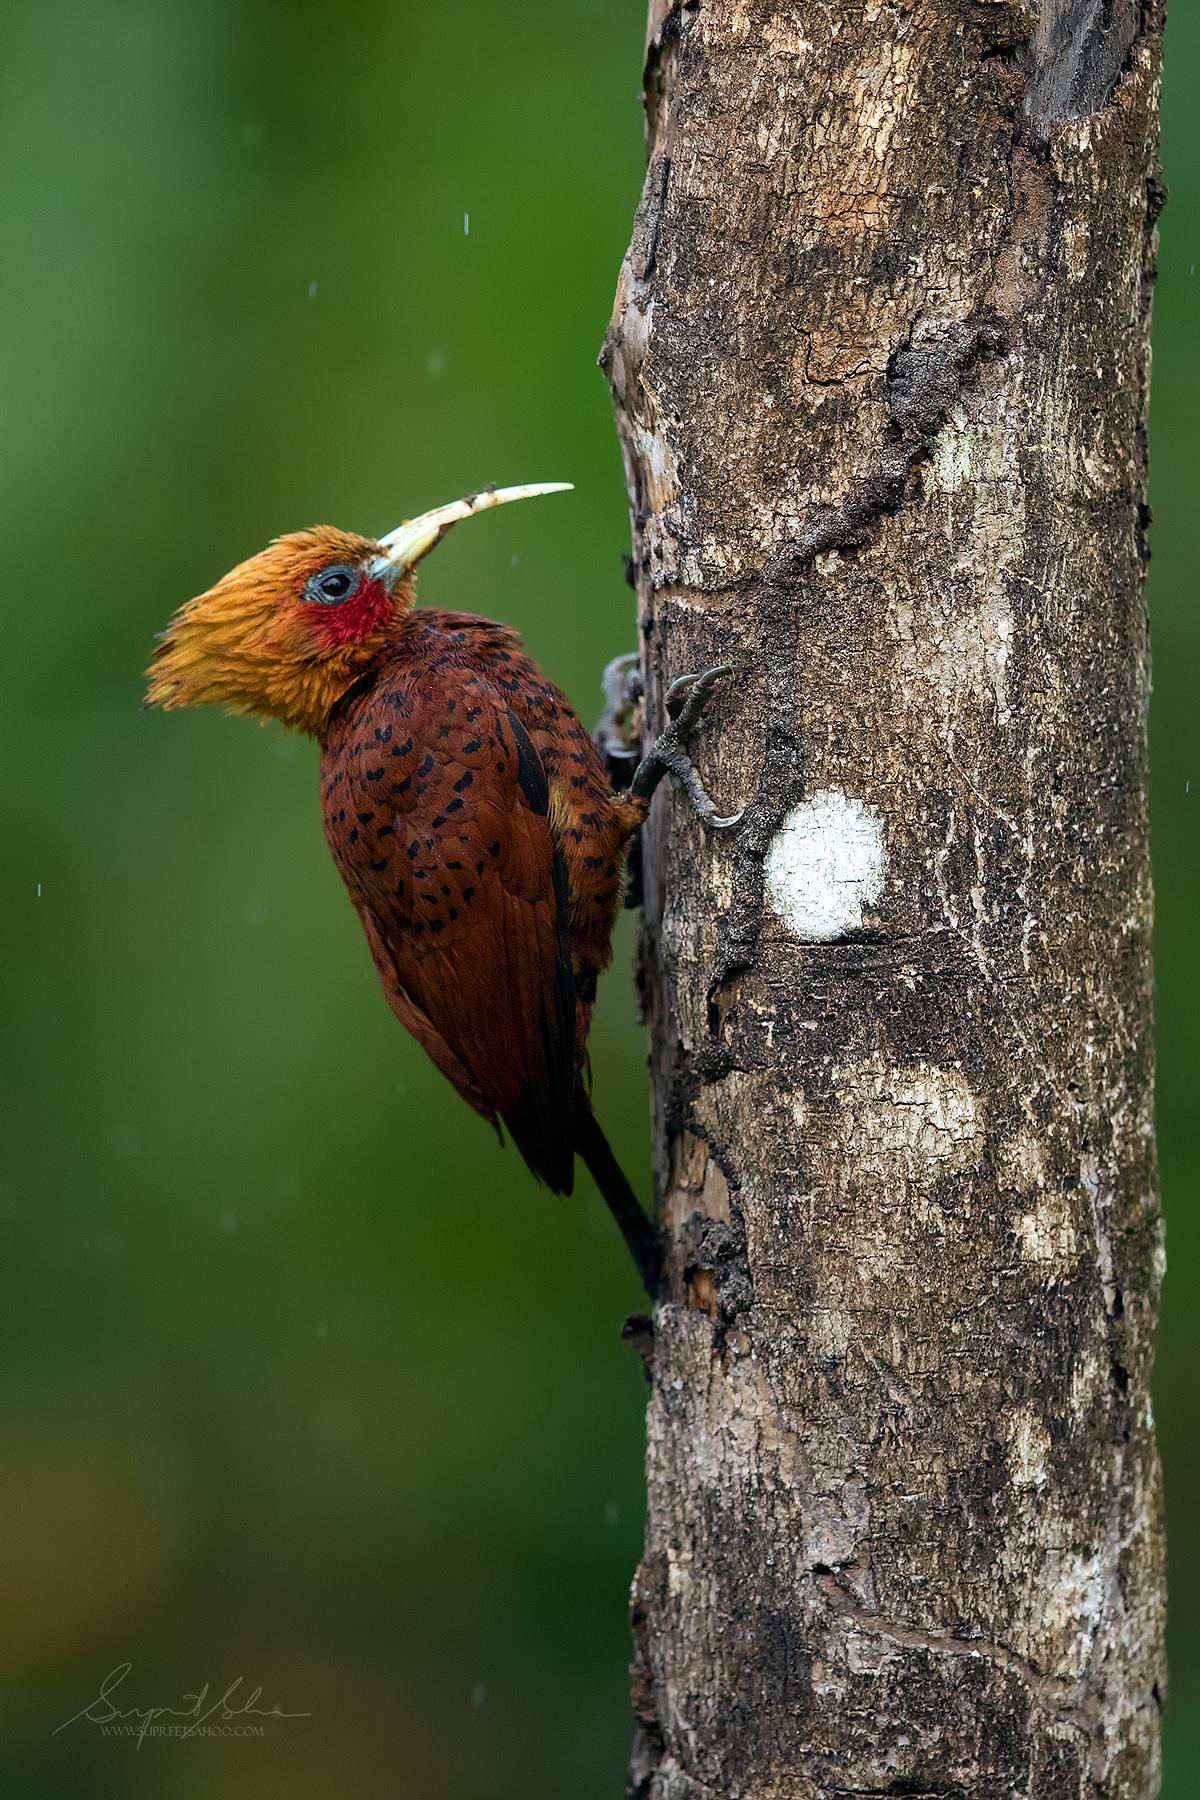 Chestnut colored woodpecker